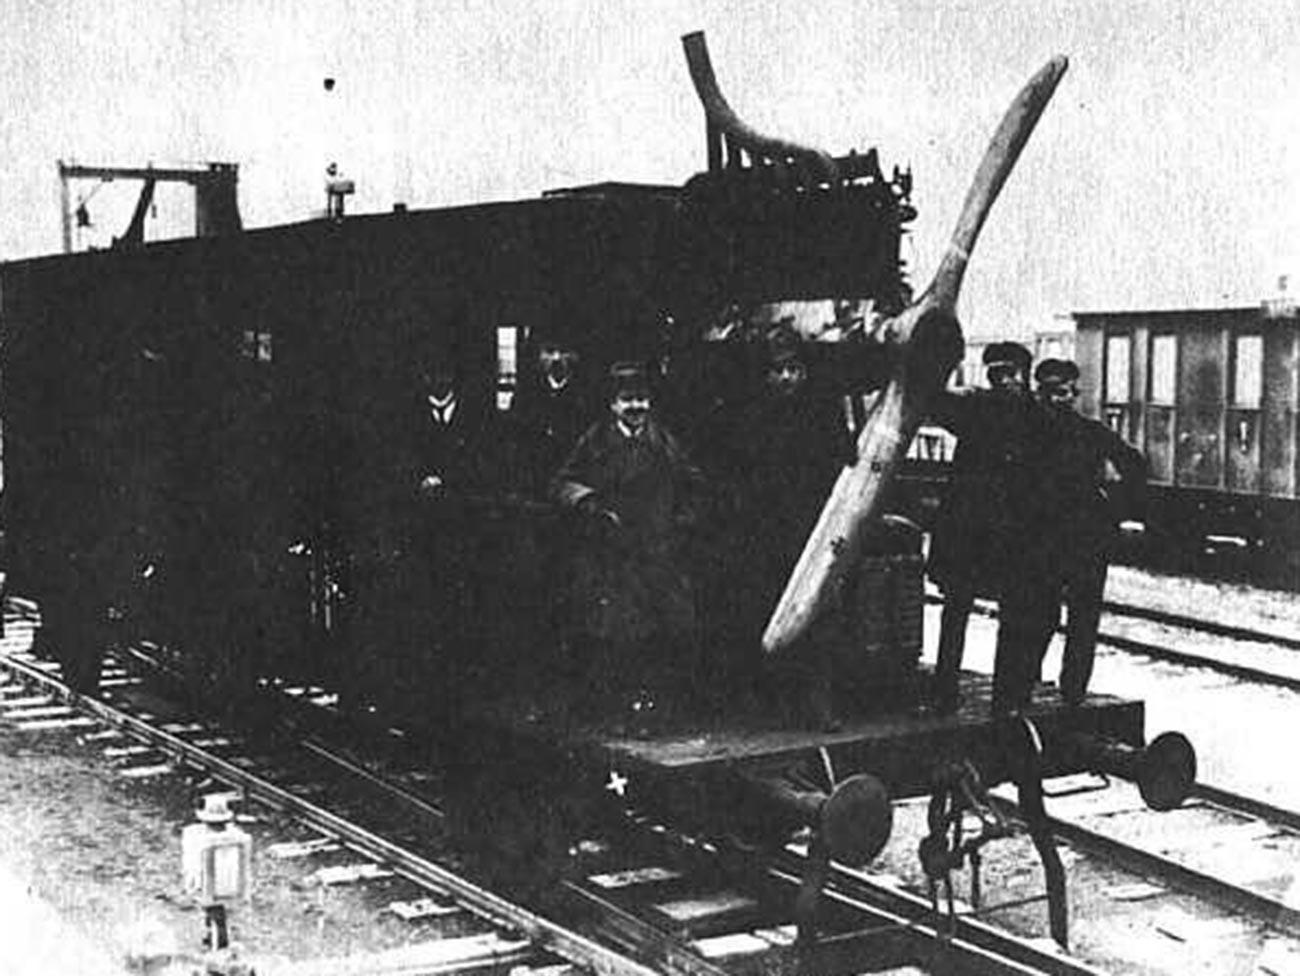 Locomotiva com hélice Dringos